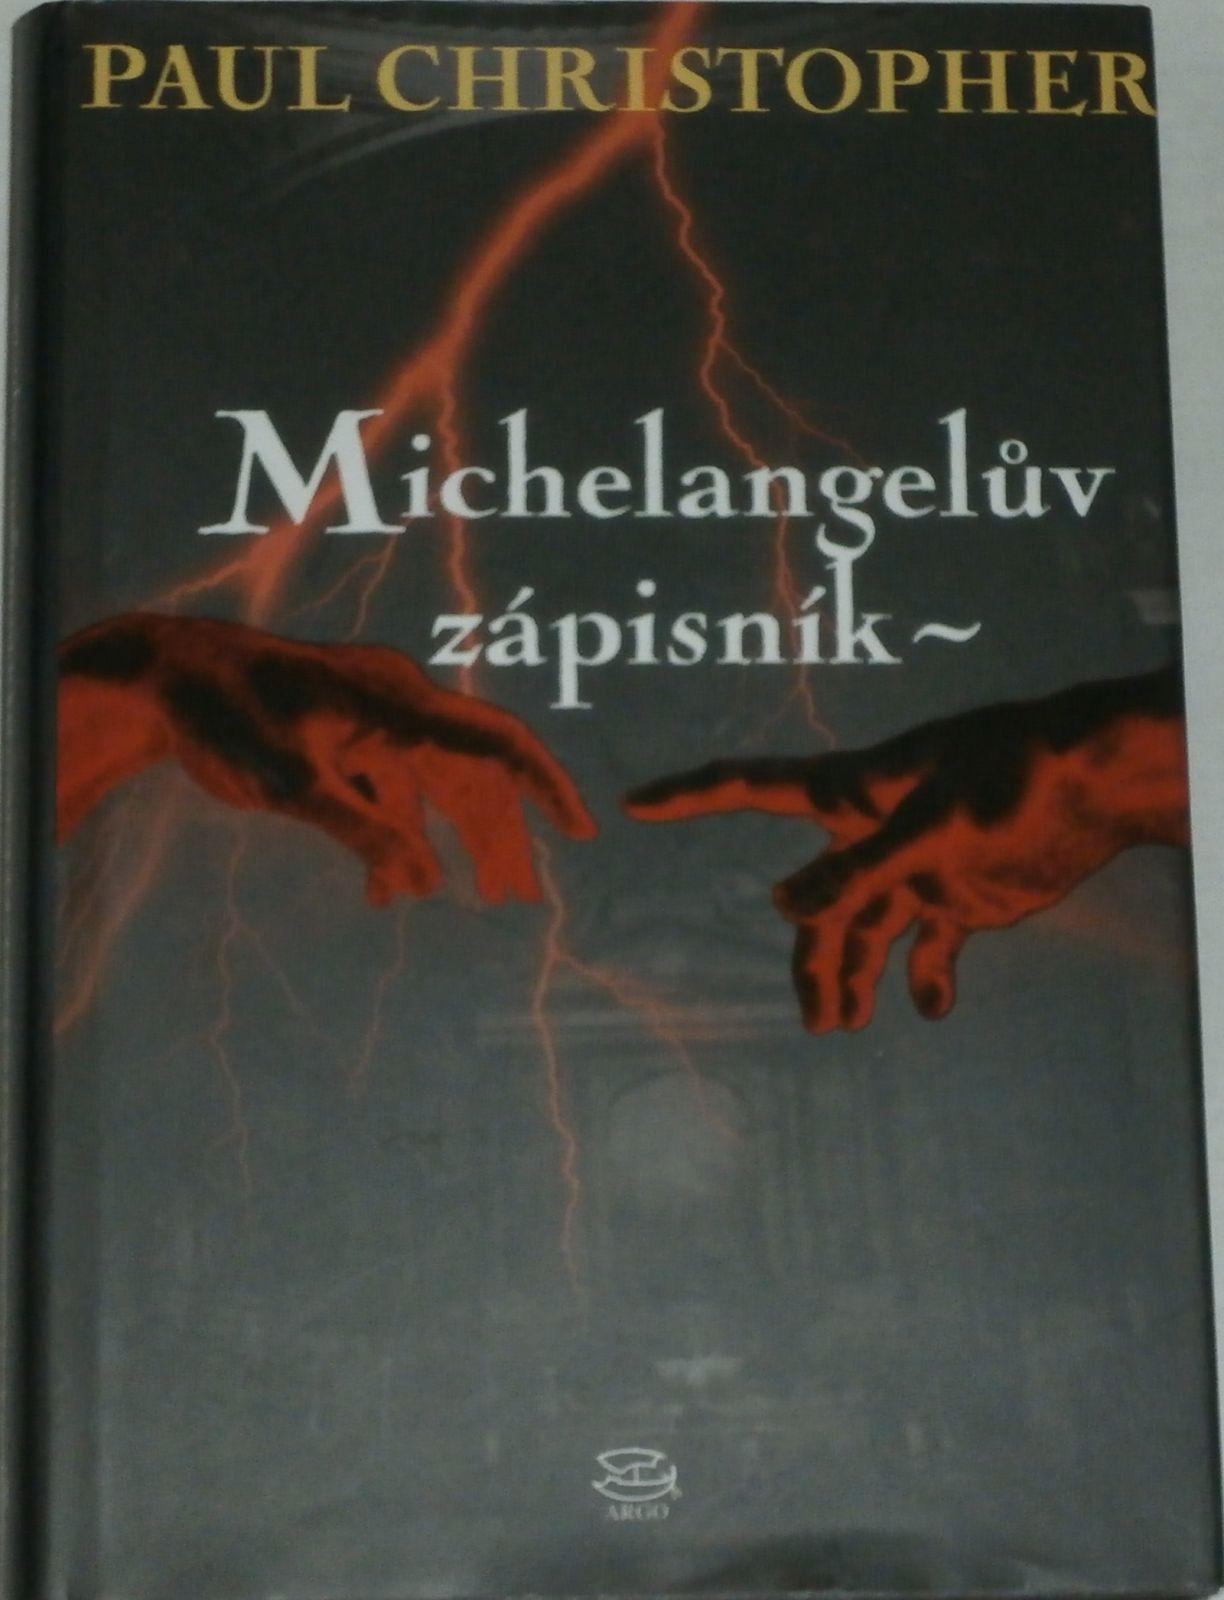 Chritopher Paul - Michelangelův zápisník